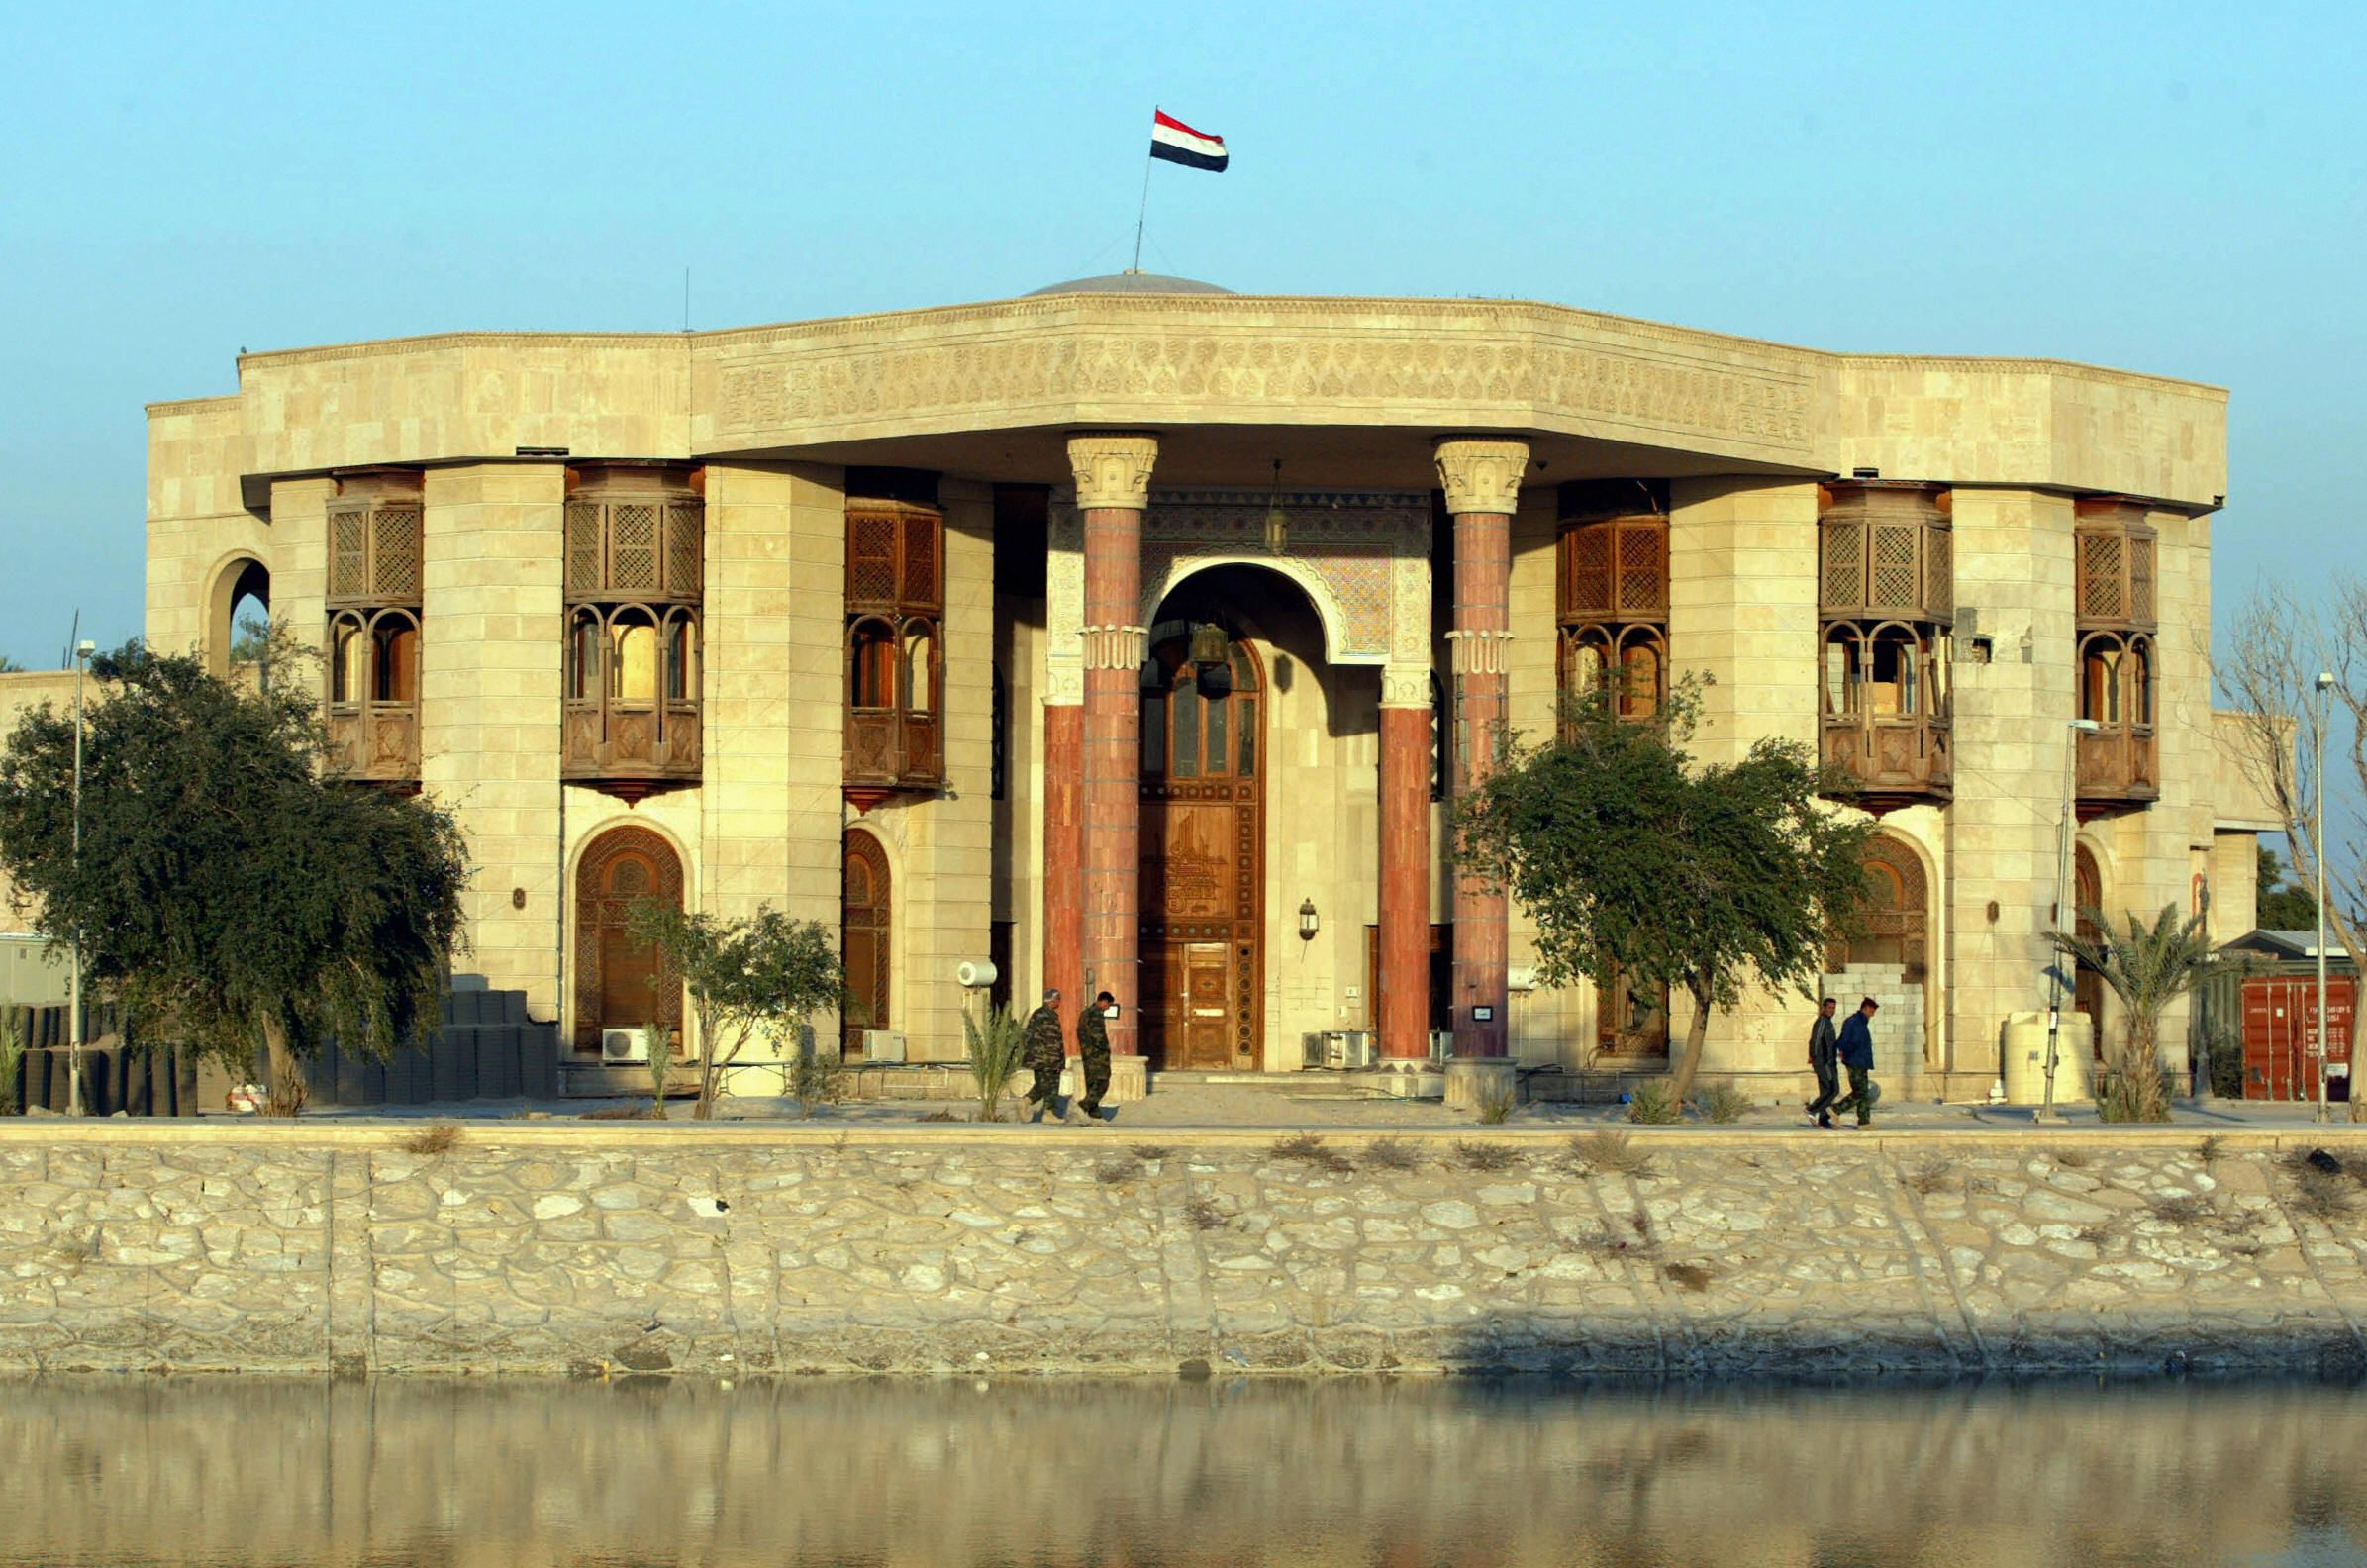 Saddam Hussein's former palace